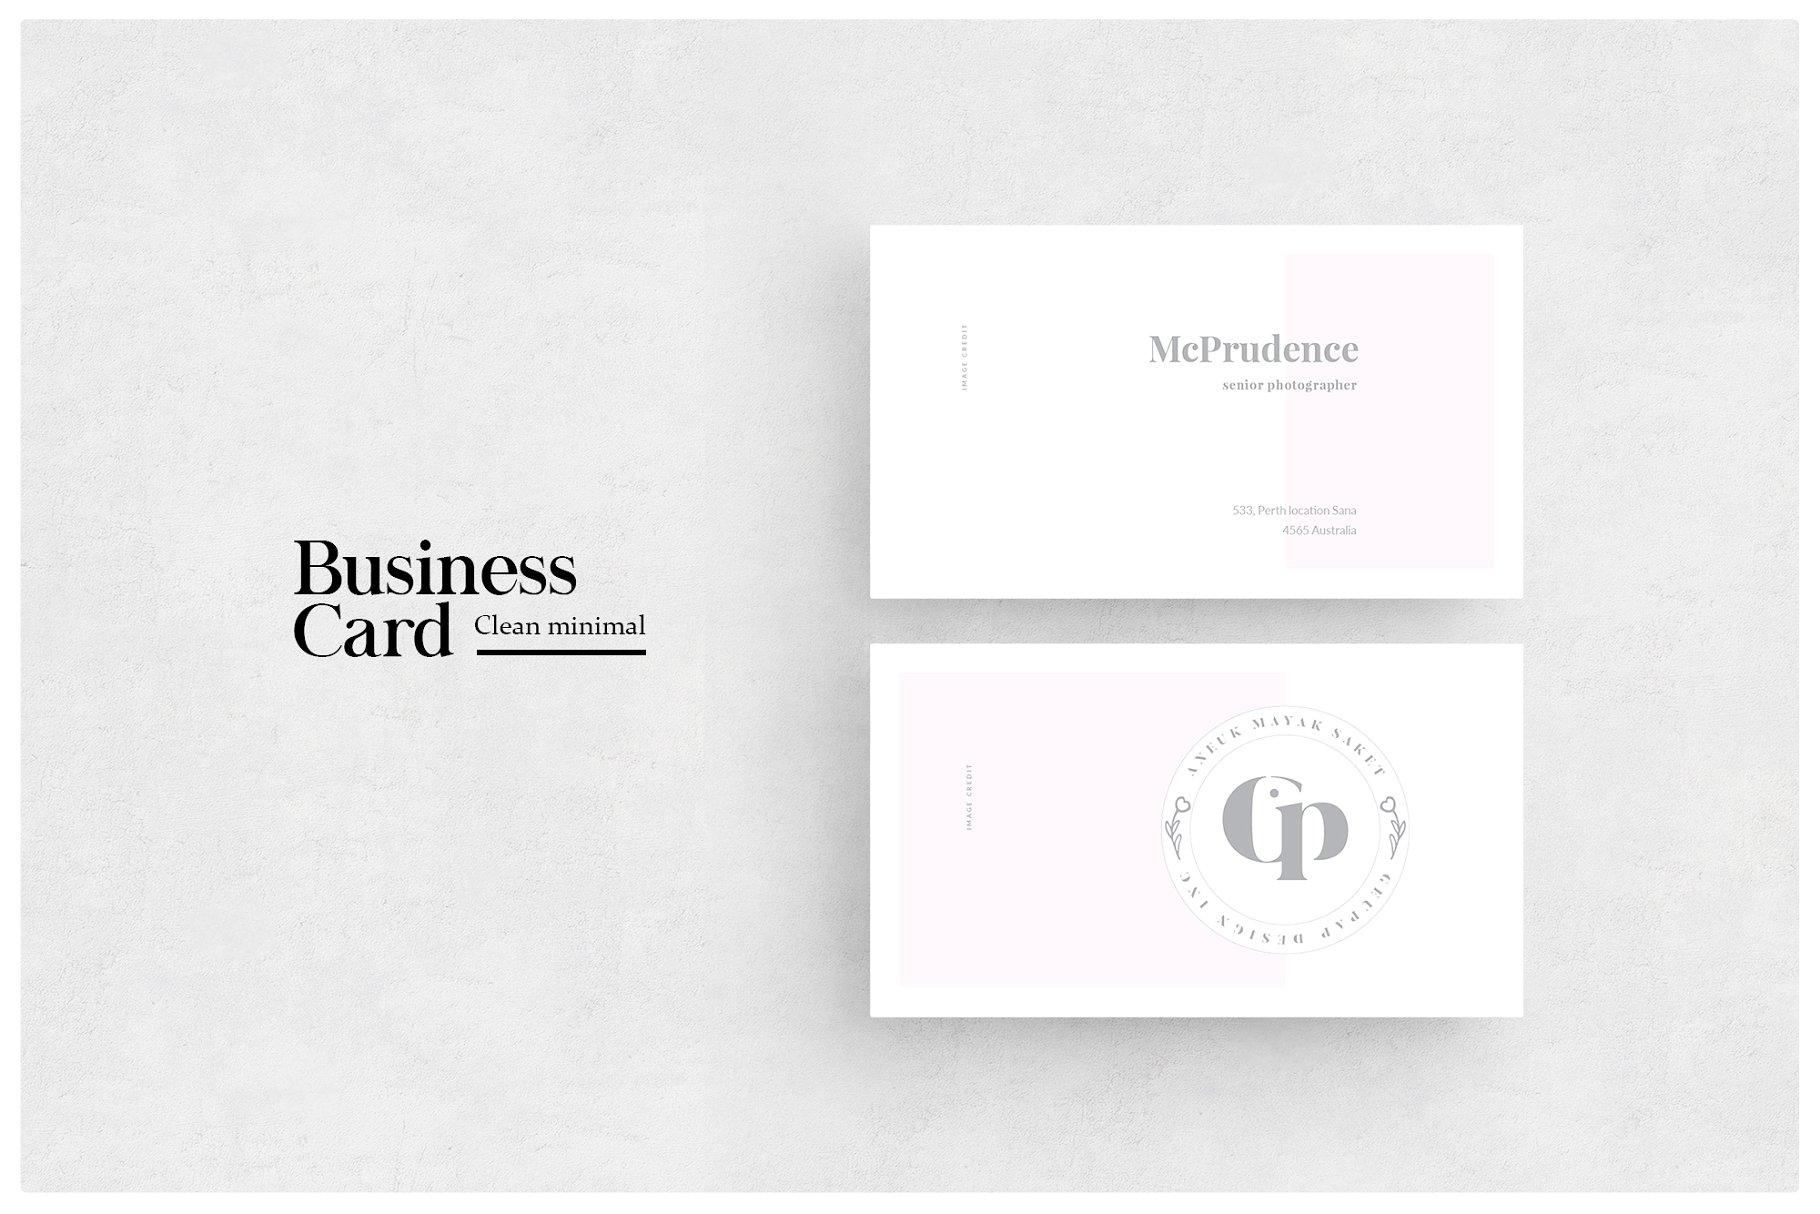 business-card-1-12.jpg